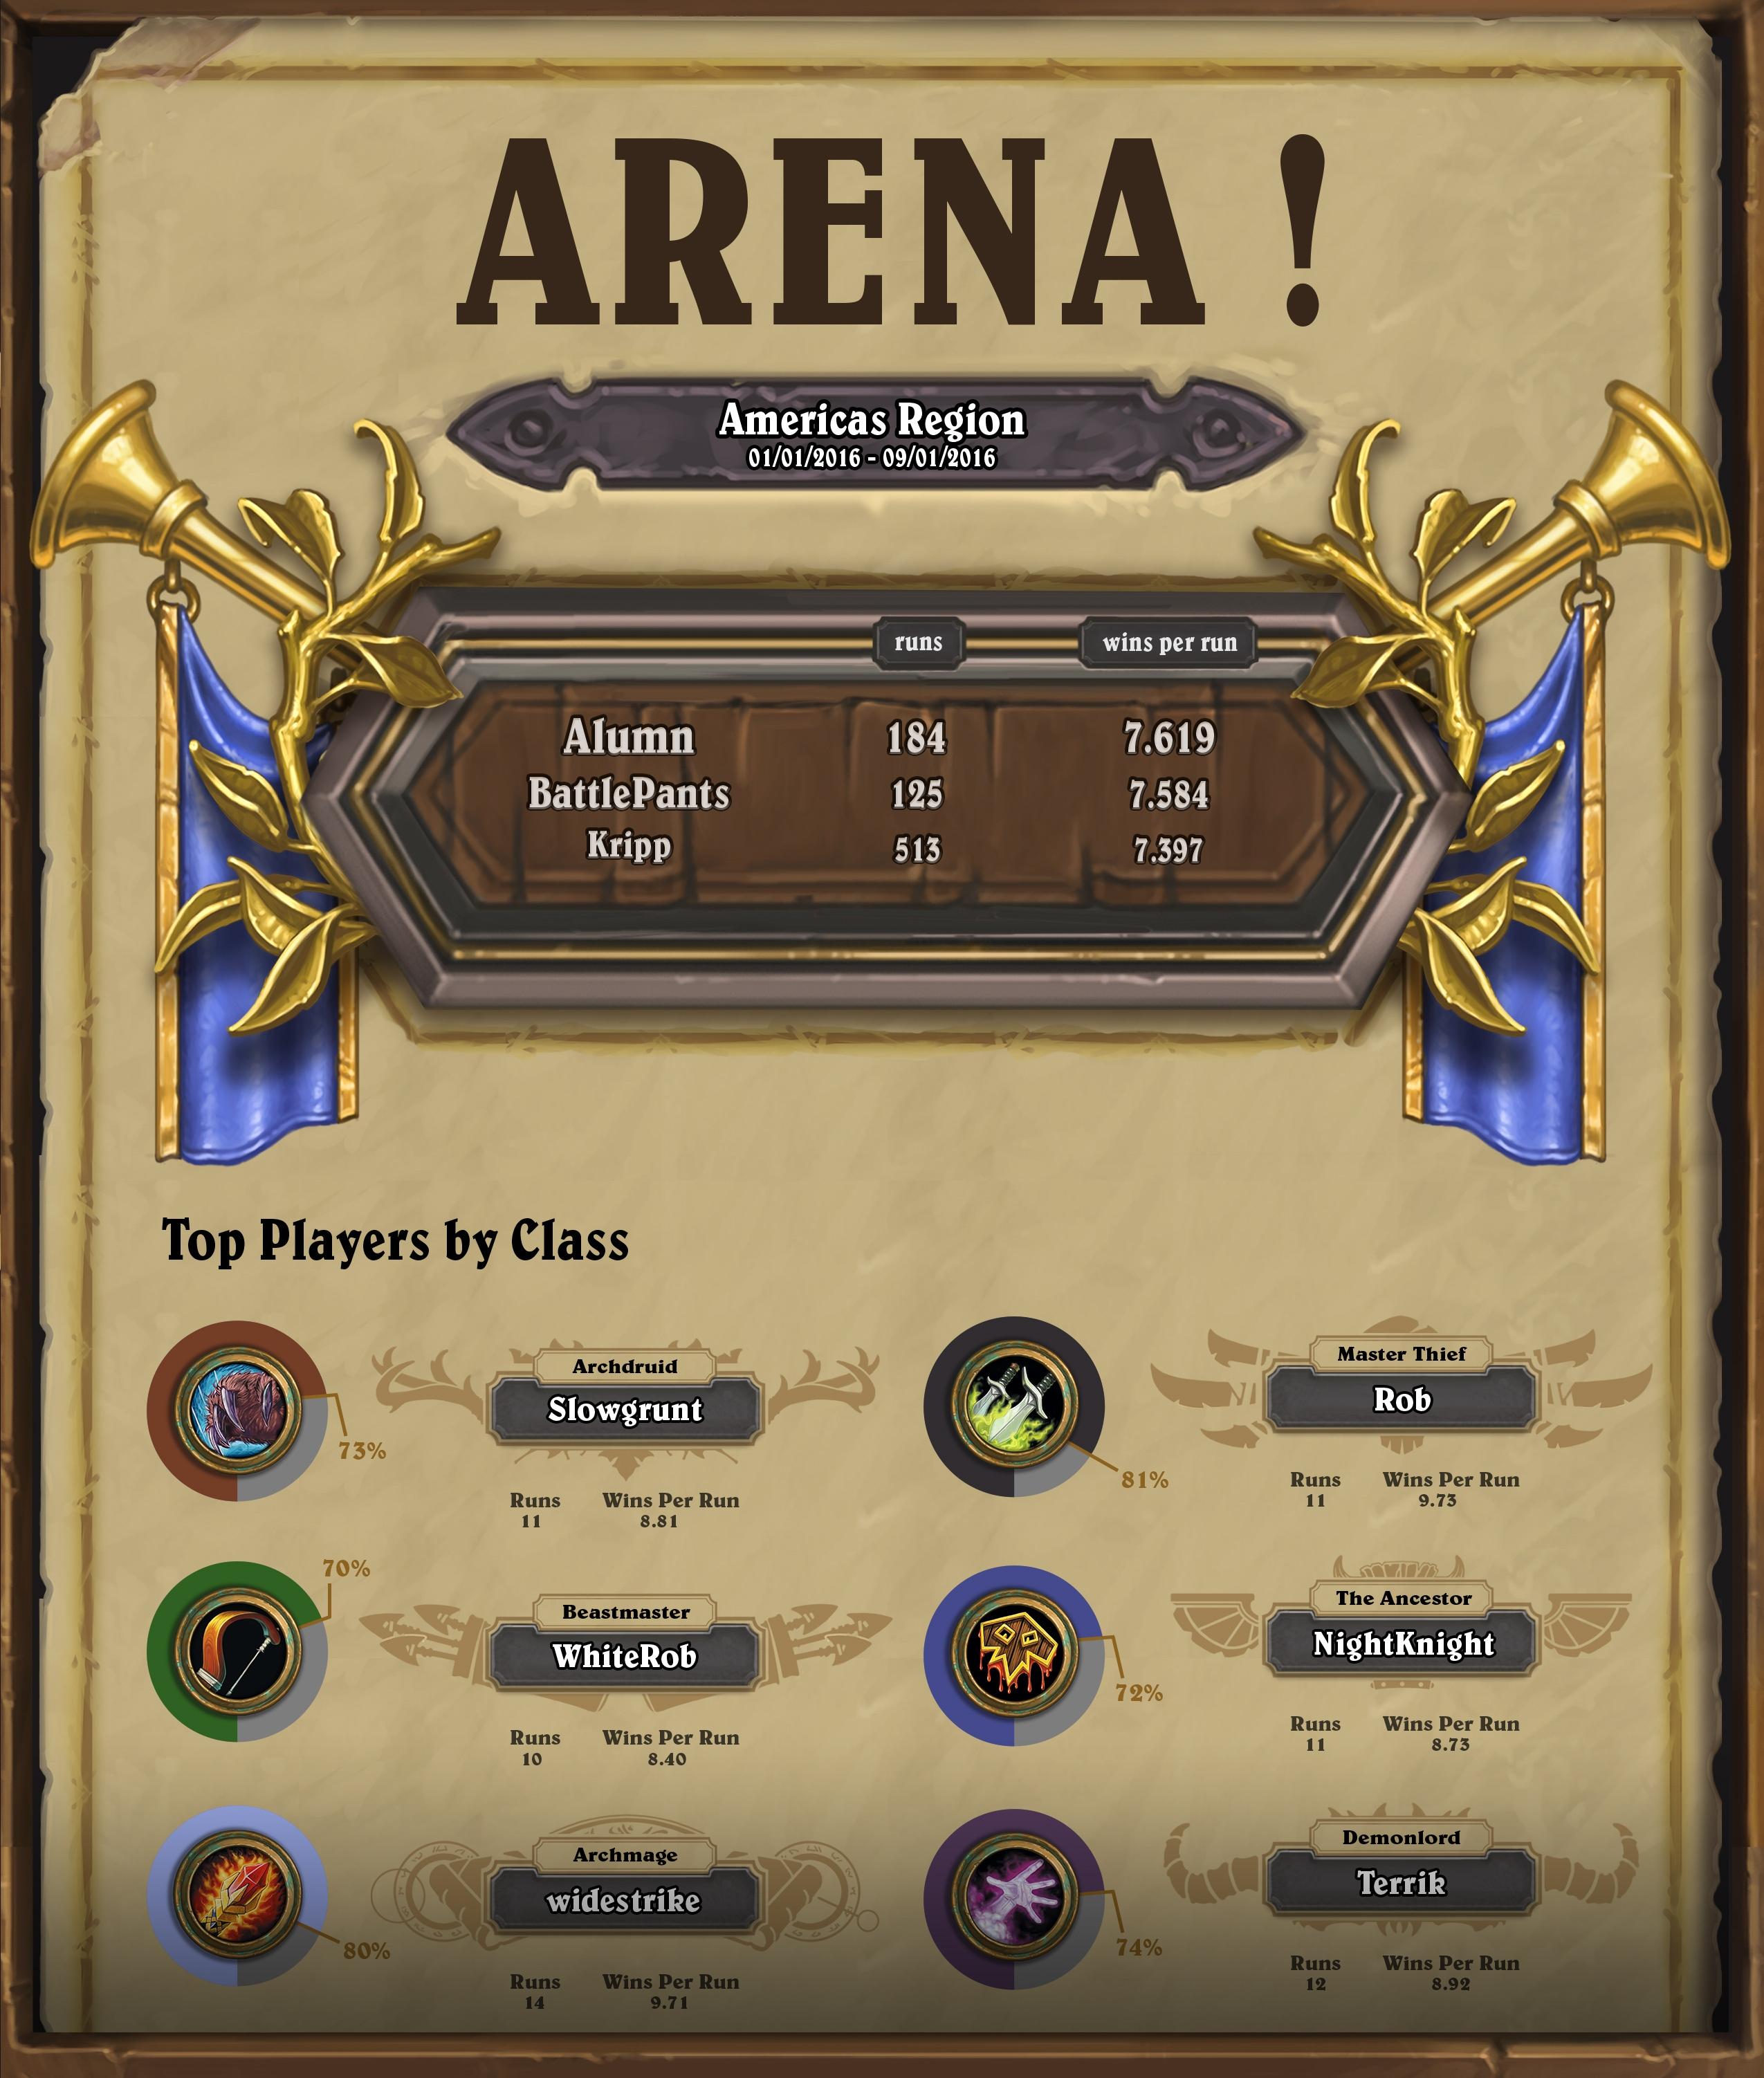 Americas Arena Infographic